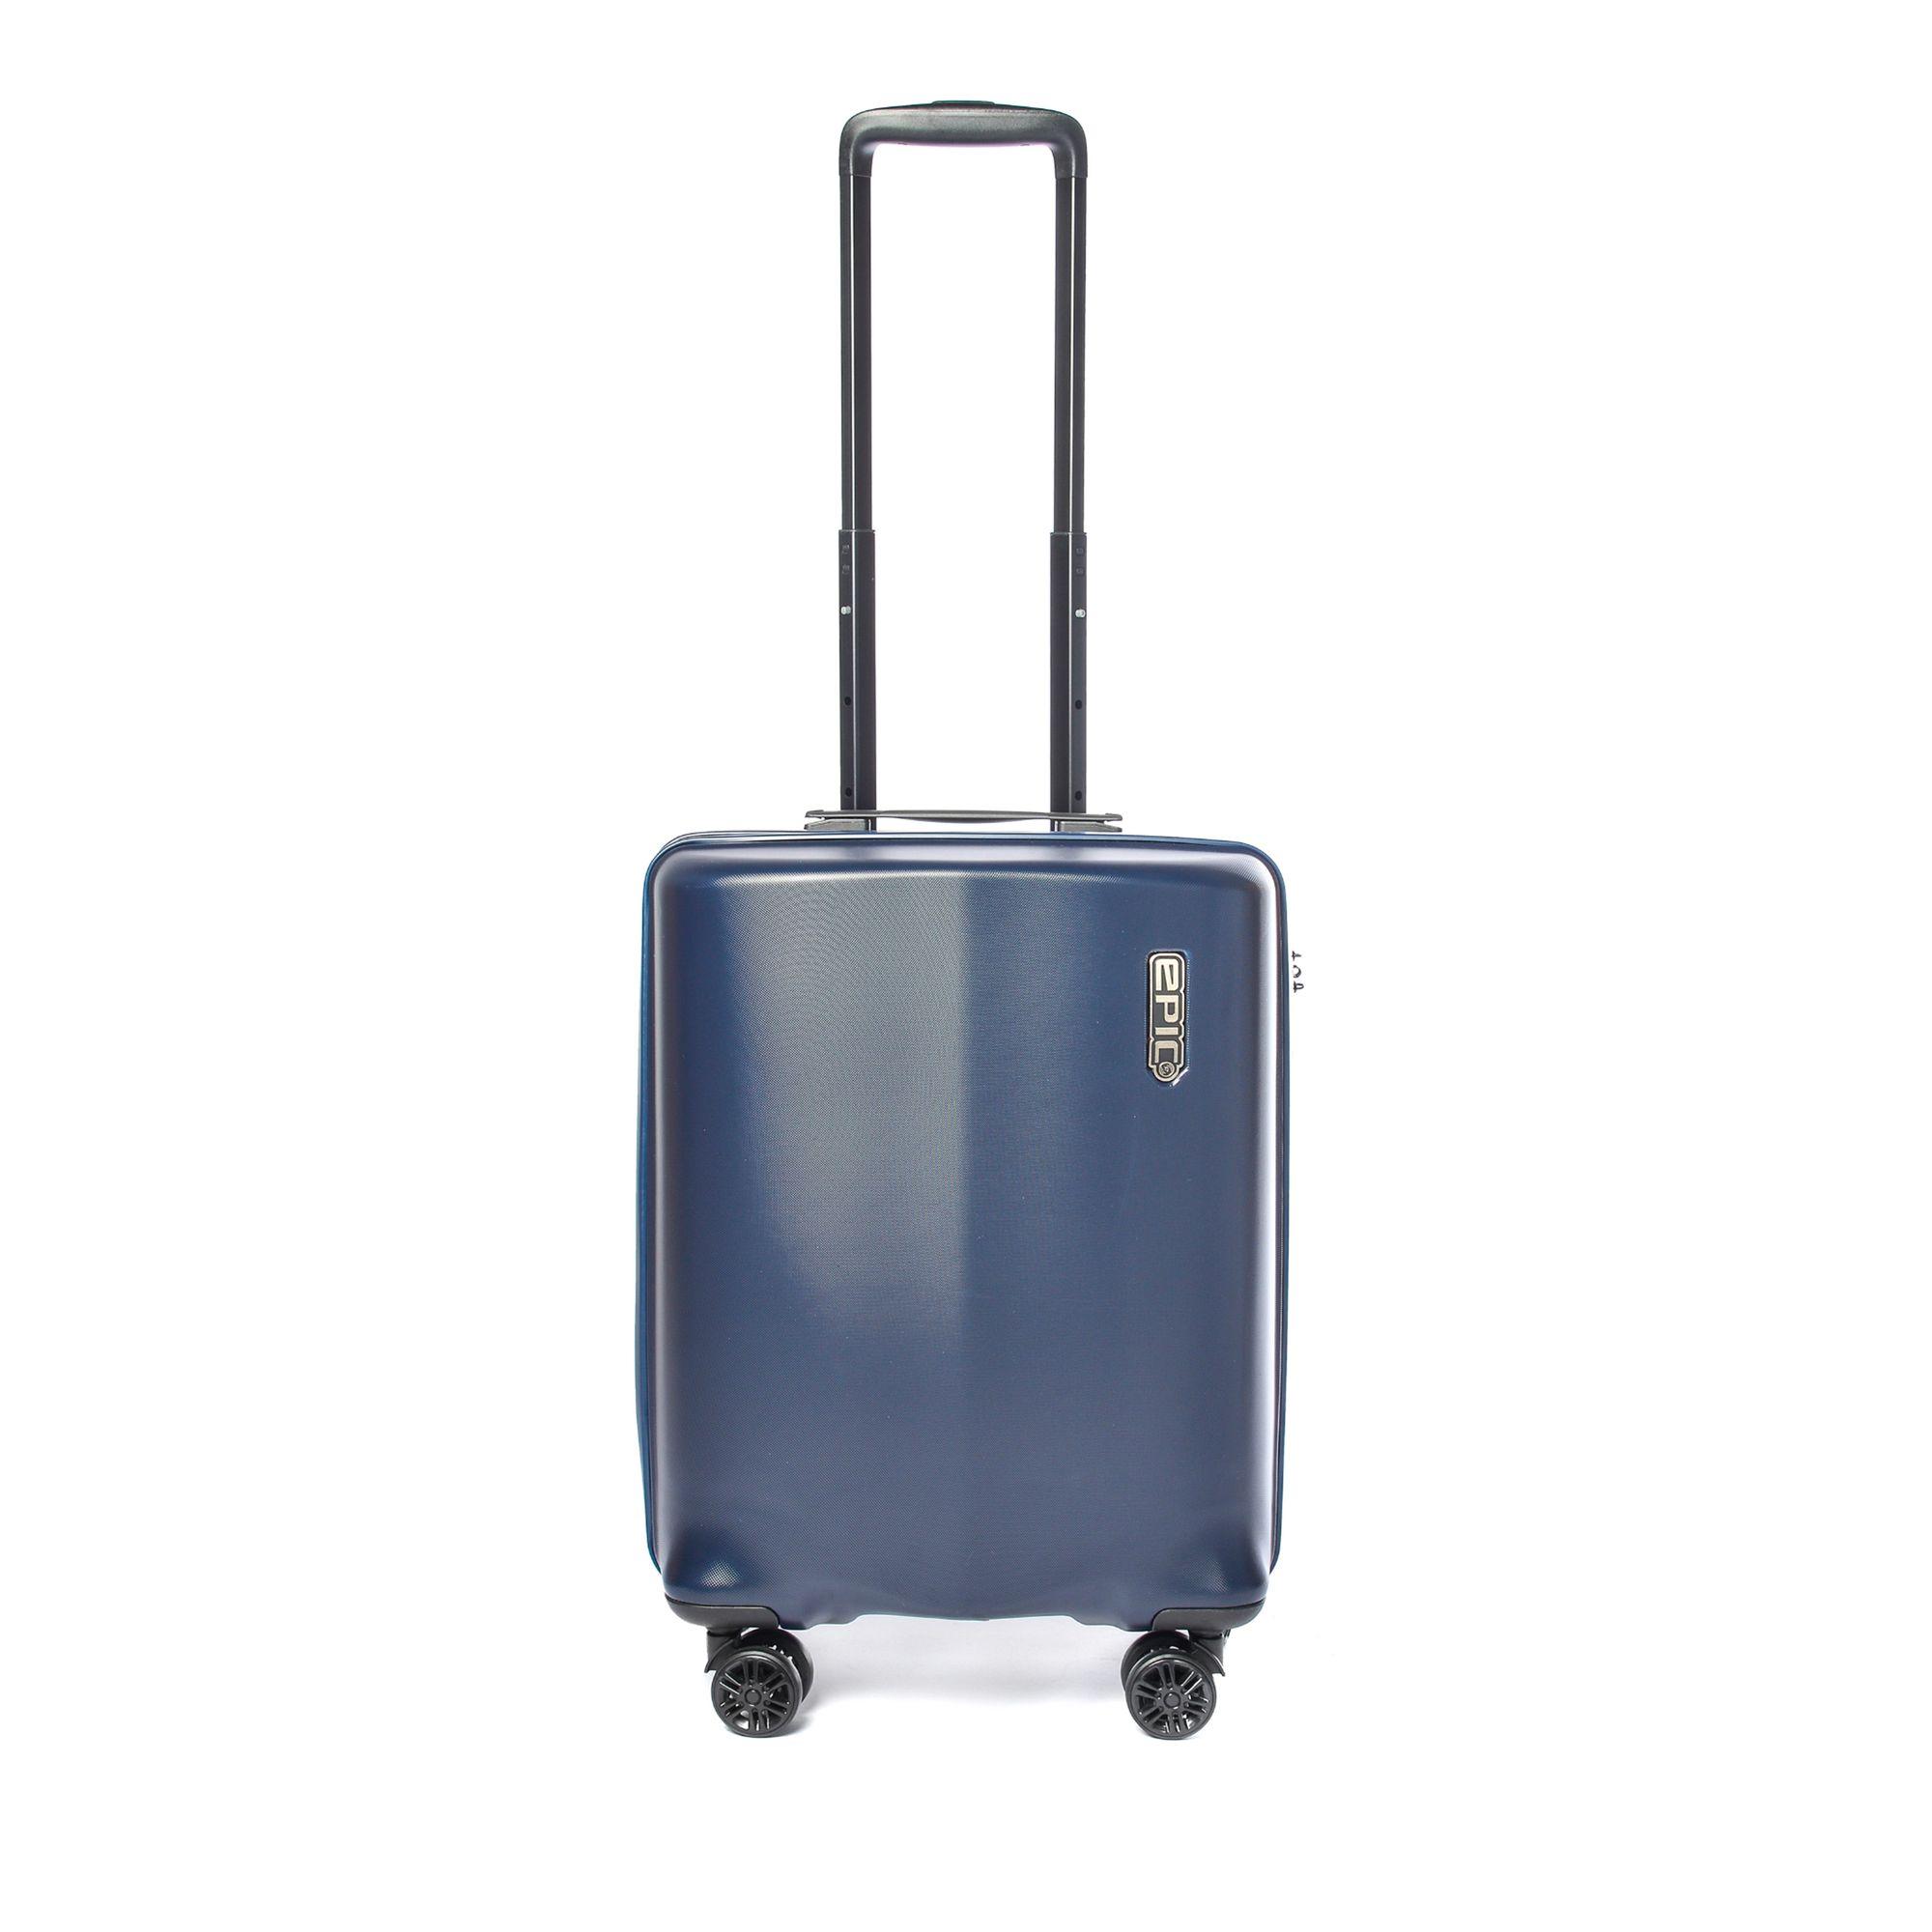 Handla online Epic Phantom BIO hård resväska, 4 hjul, 5566